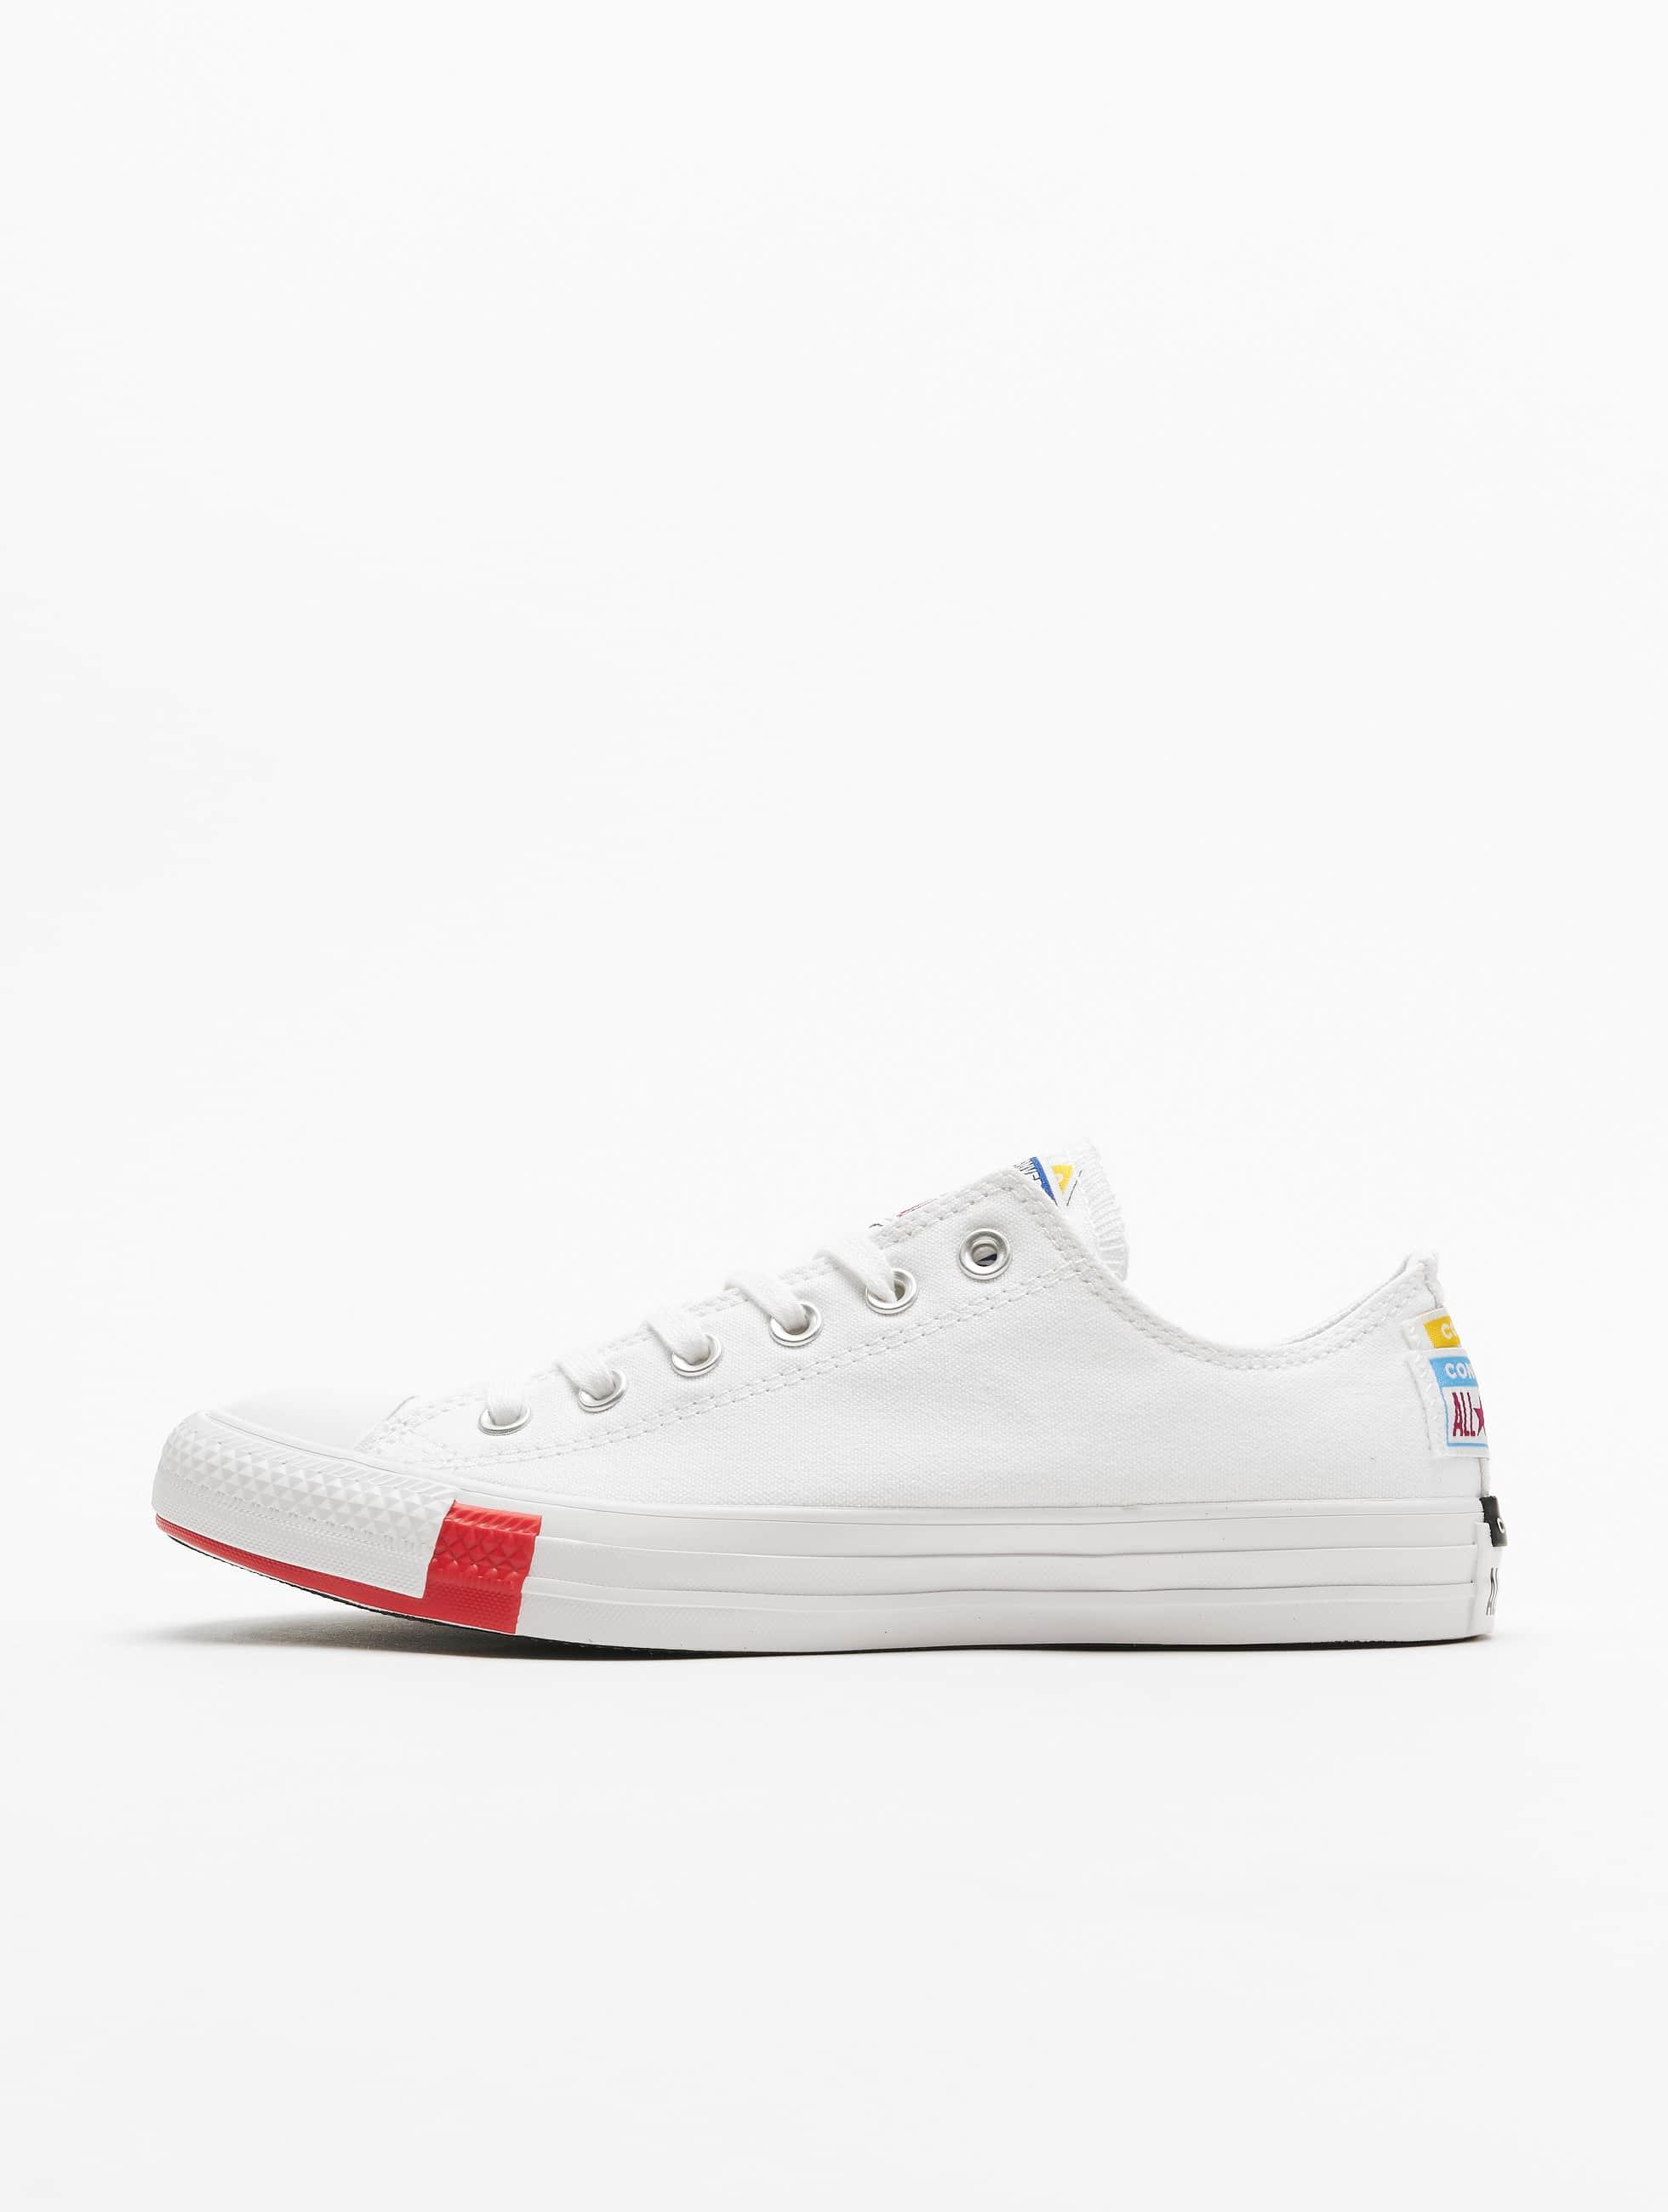 Converse Ctas Ox Sneakers WhiteUniversity RedBlack